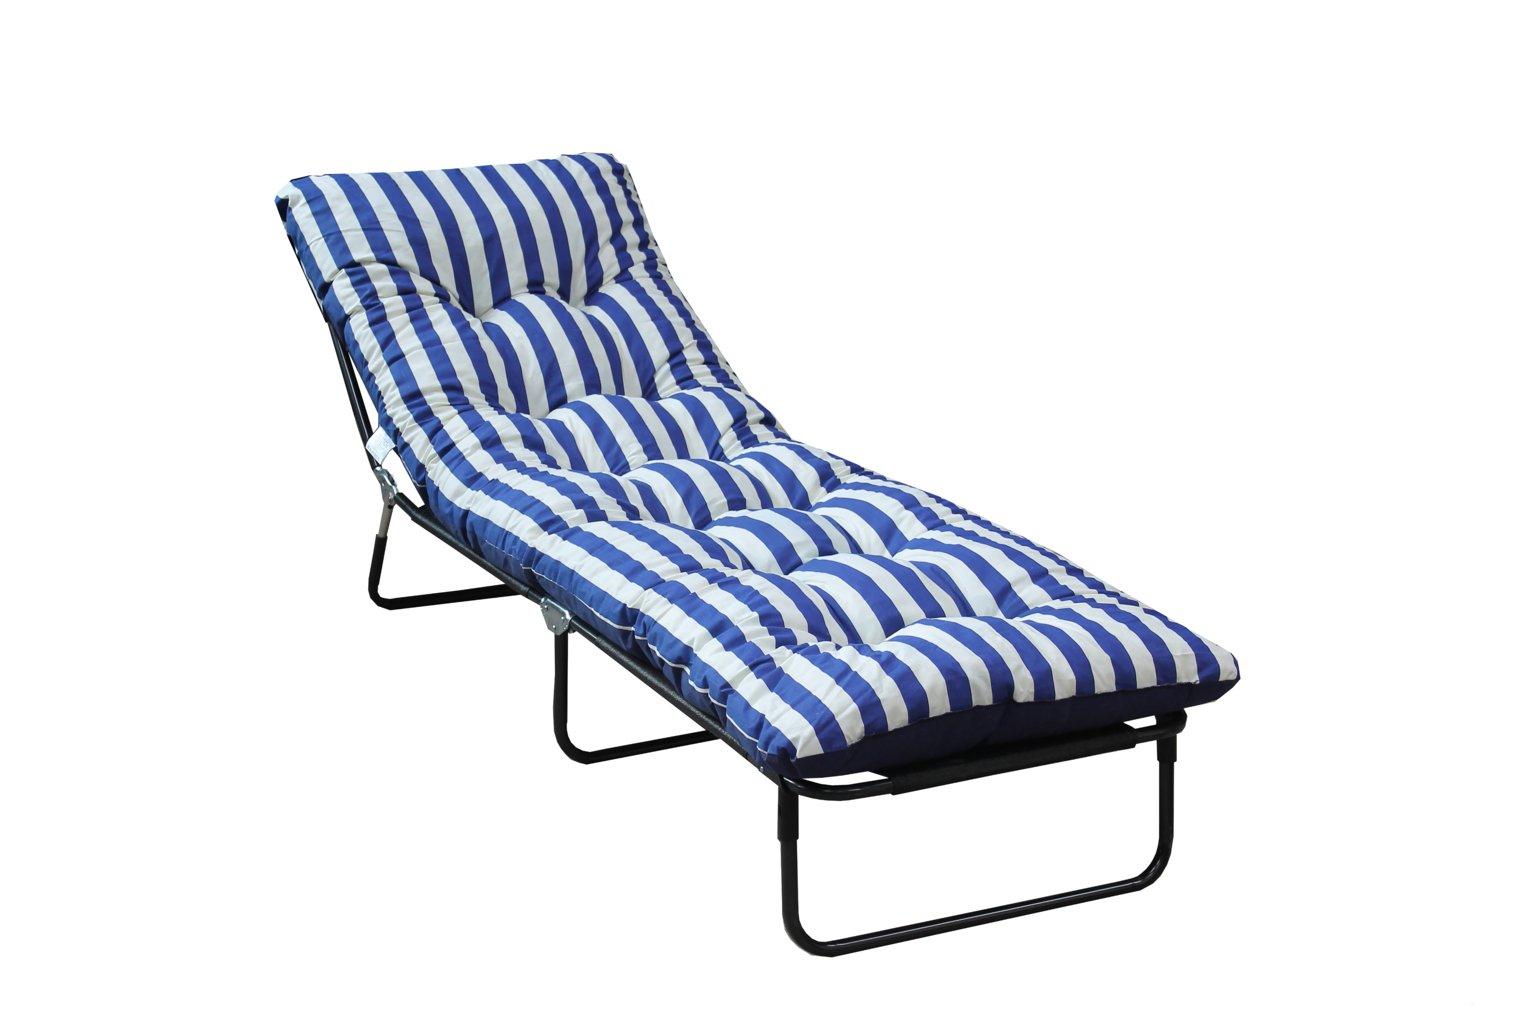 Argos Home Metal Sun Lounger with Cushion - Blue